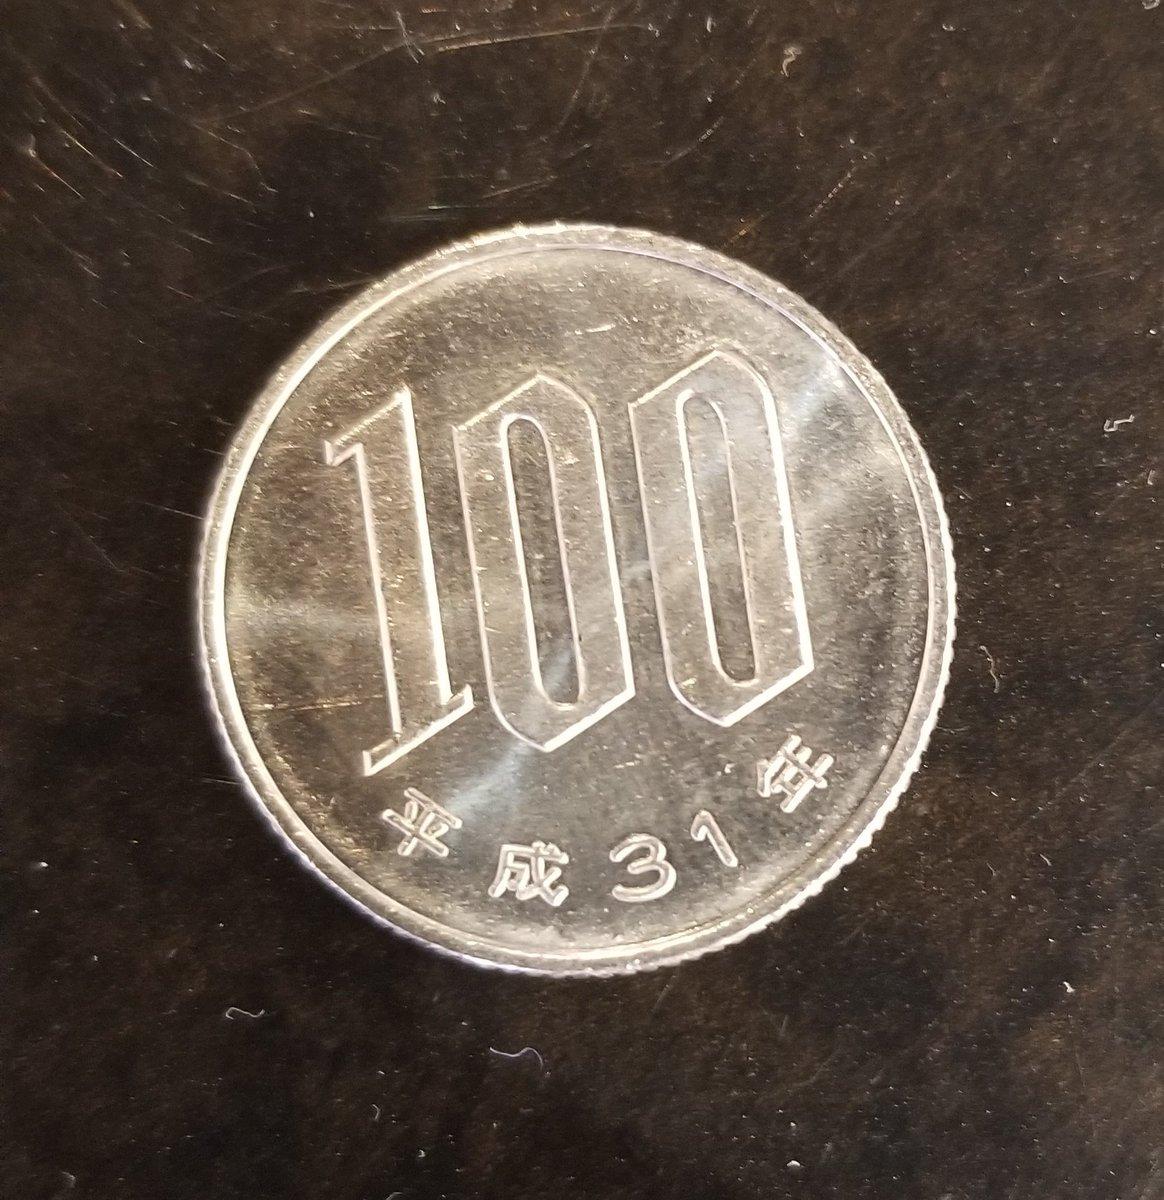 レア 年 硬貨 平成 31